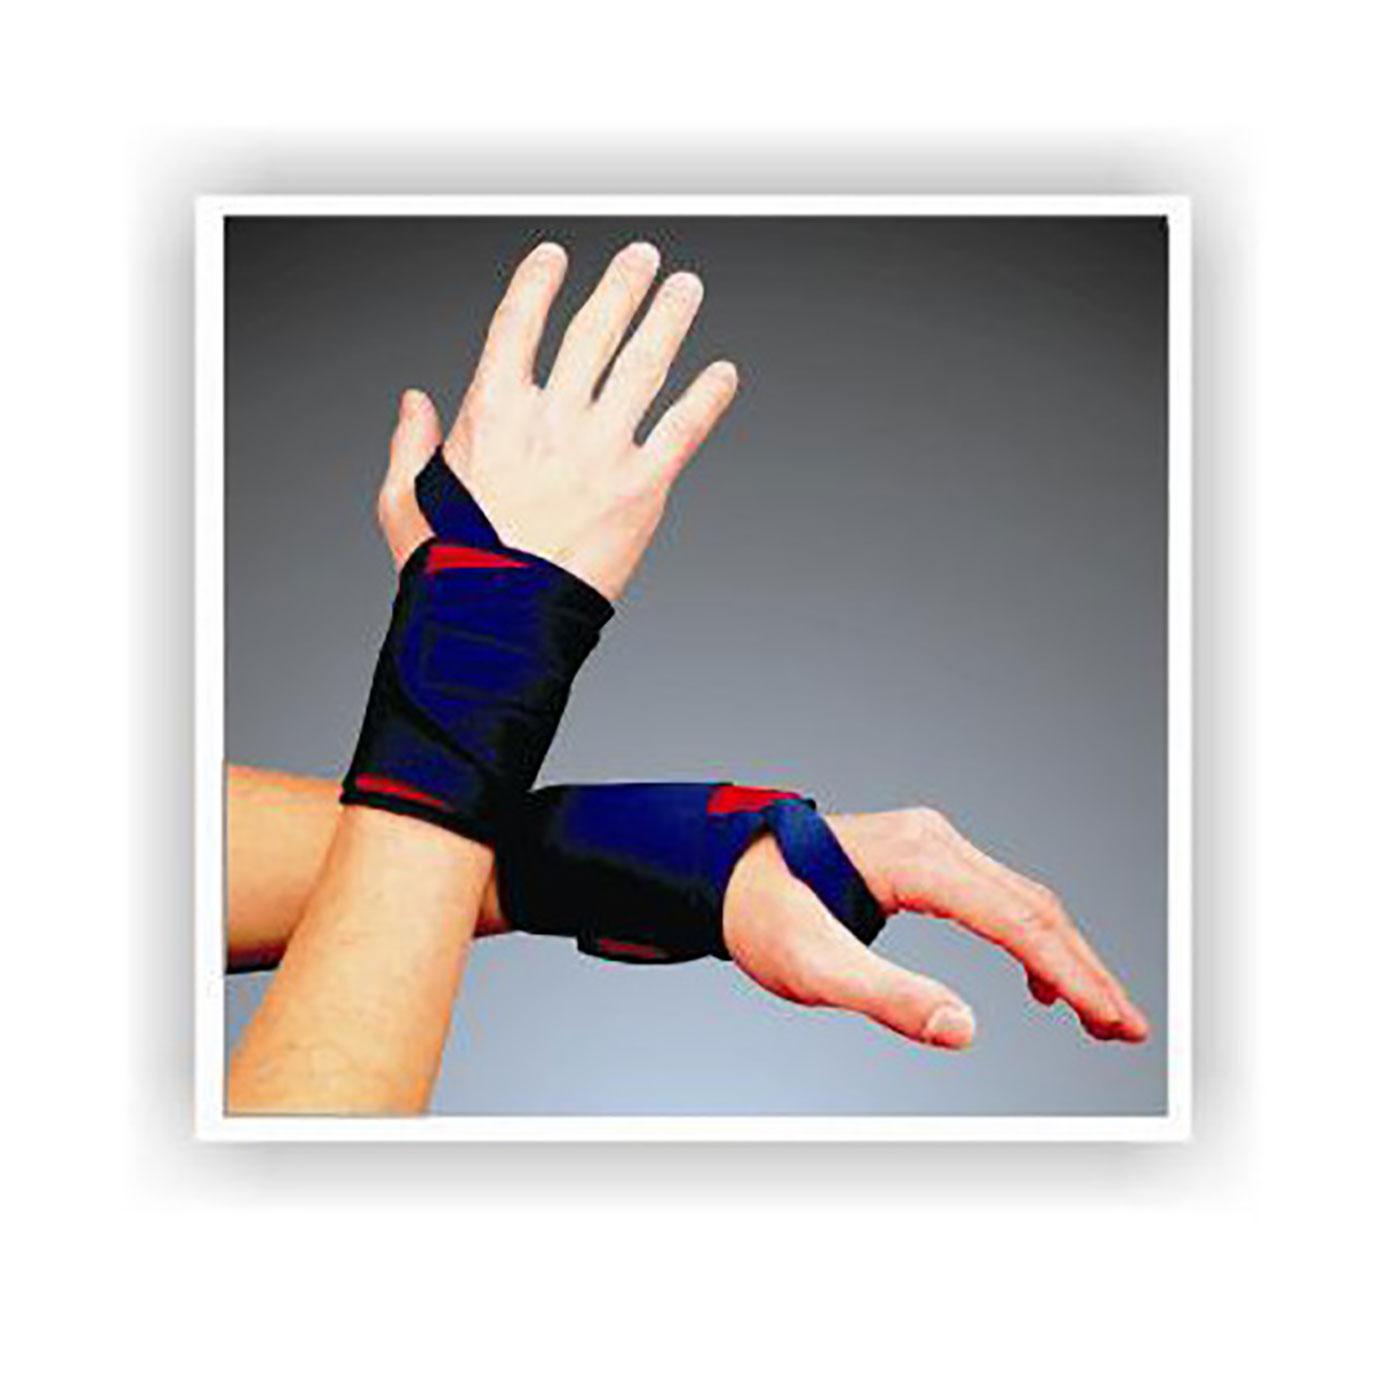 Impacto Wrist Support